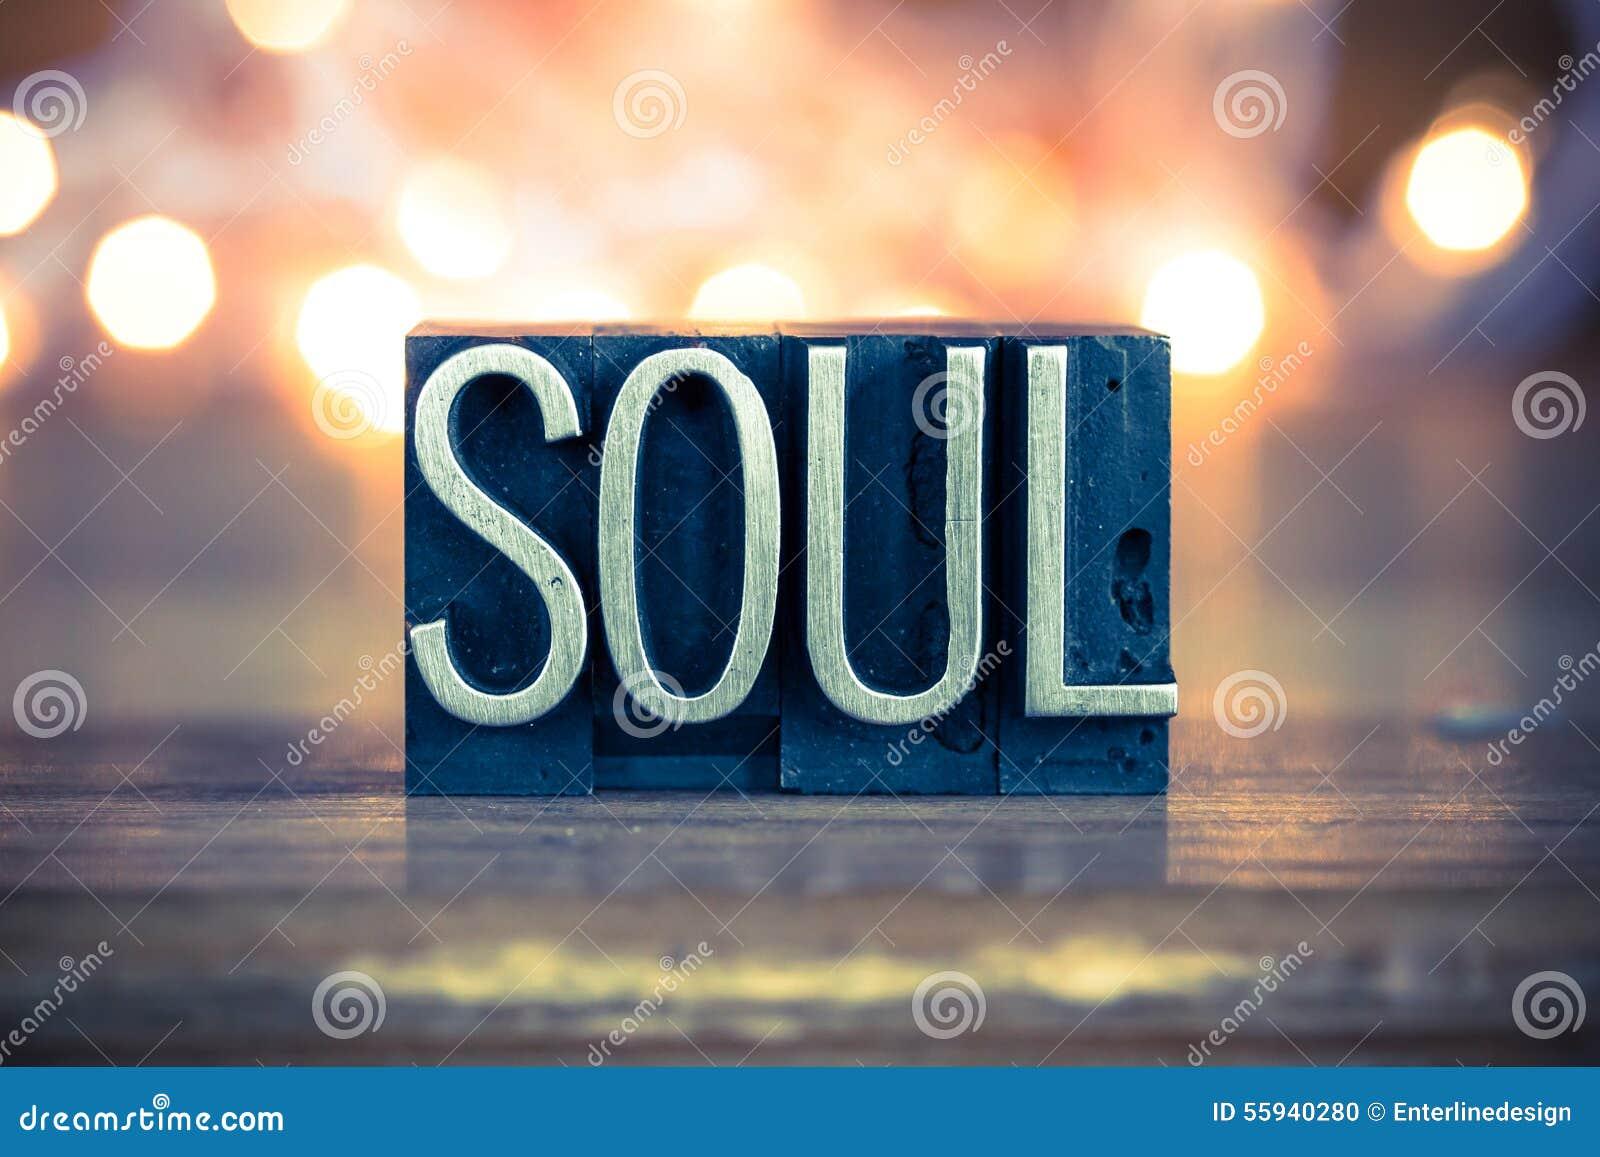 Soul concept metal letterpress type stock photo image for Concept metal